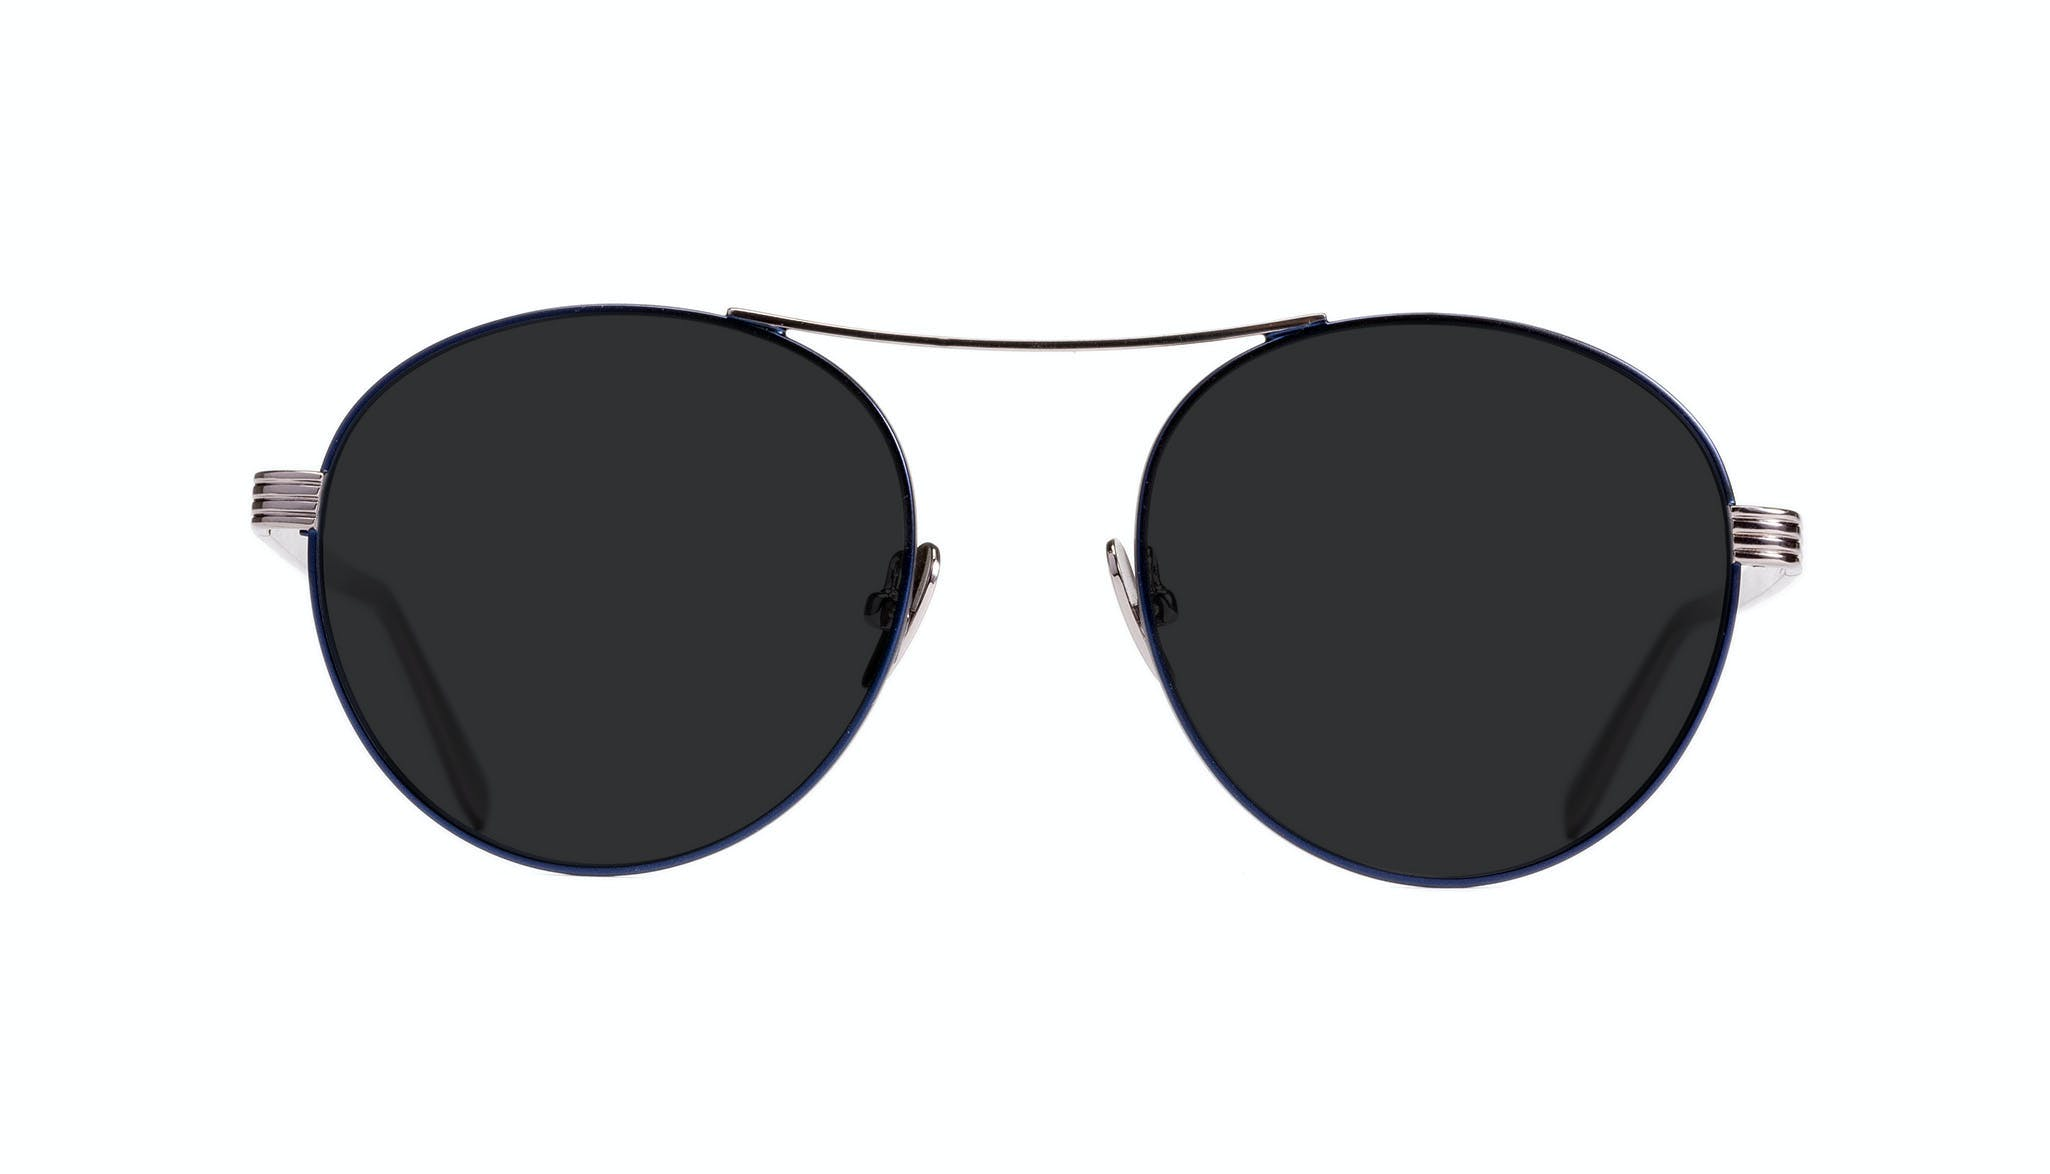 Affordable Fashion Glasses Round Eyeglasses Women Prize Midnight